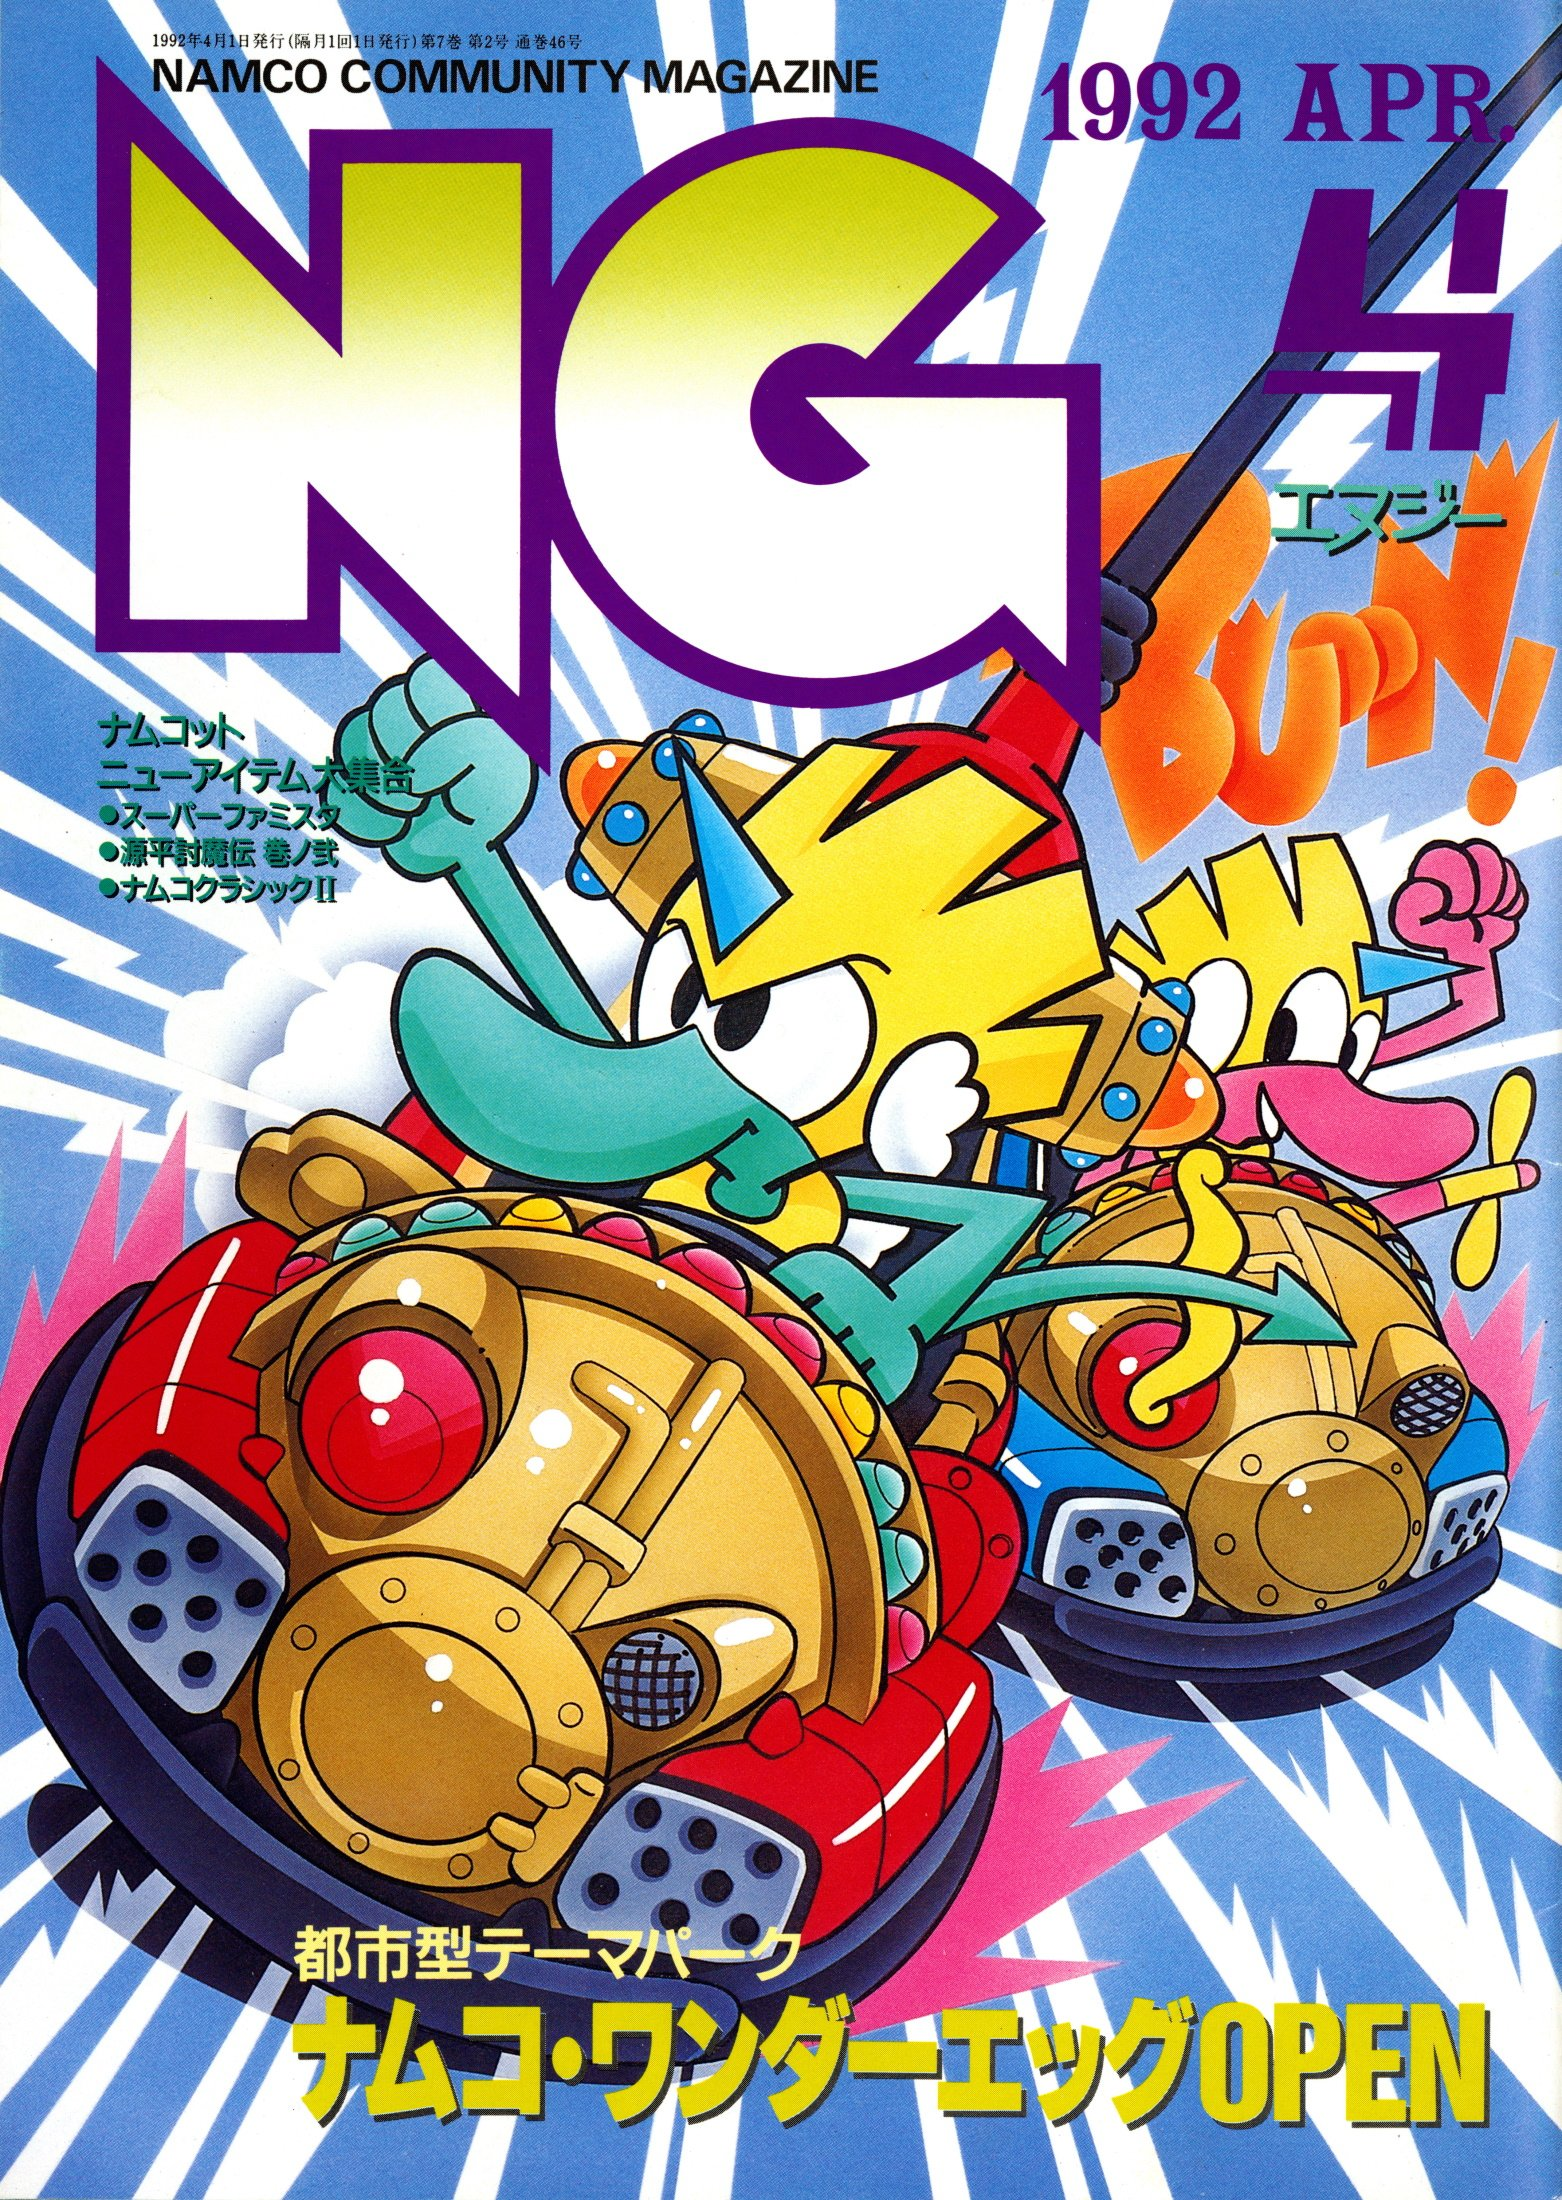 NG Namco Community Magazine Issue 46 (April 1992)